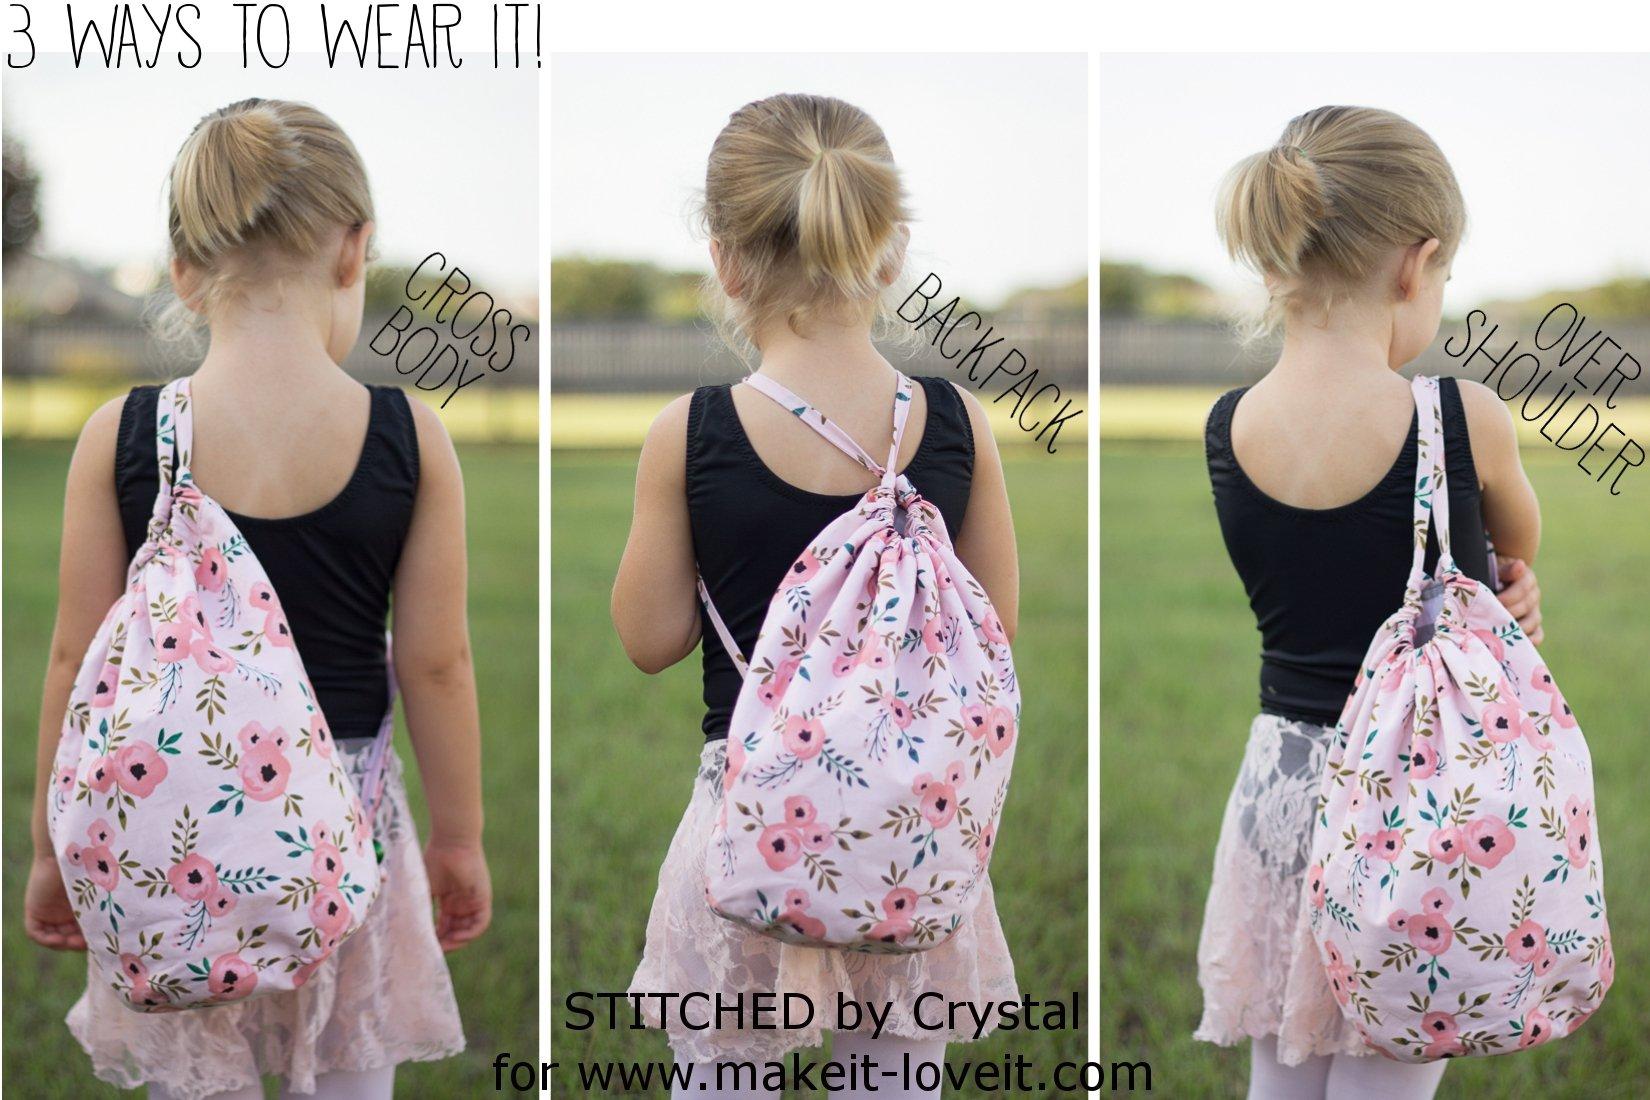 Sew a simple bucket bag